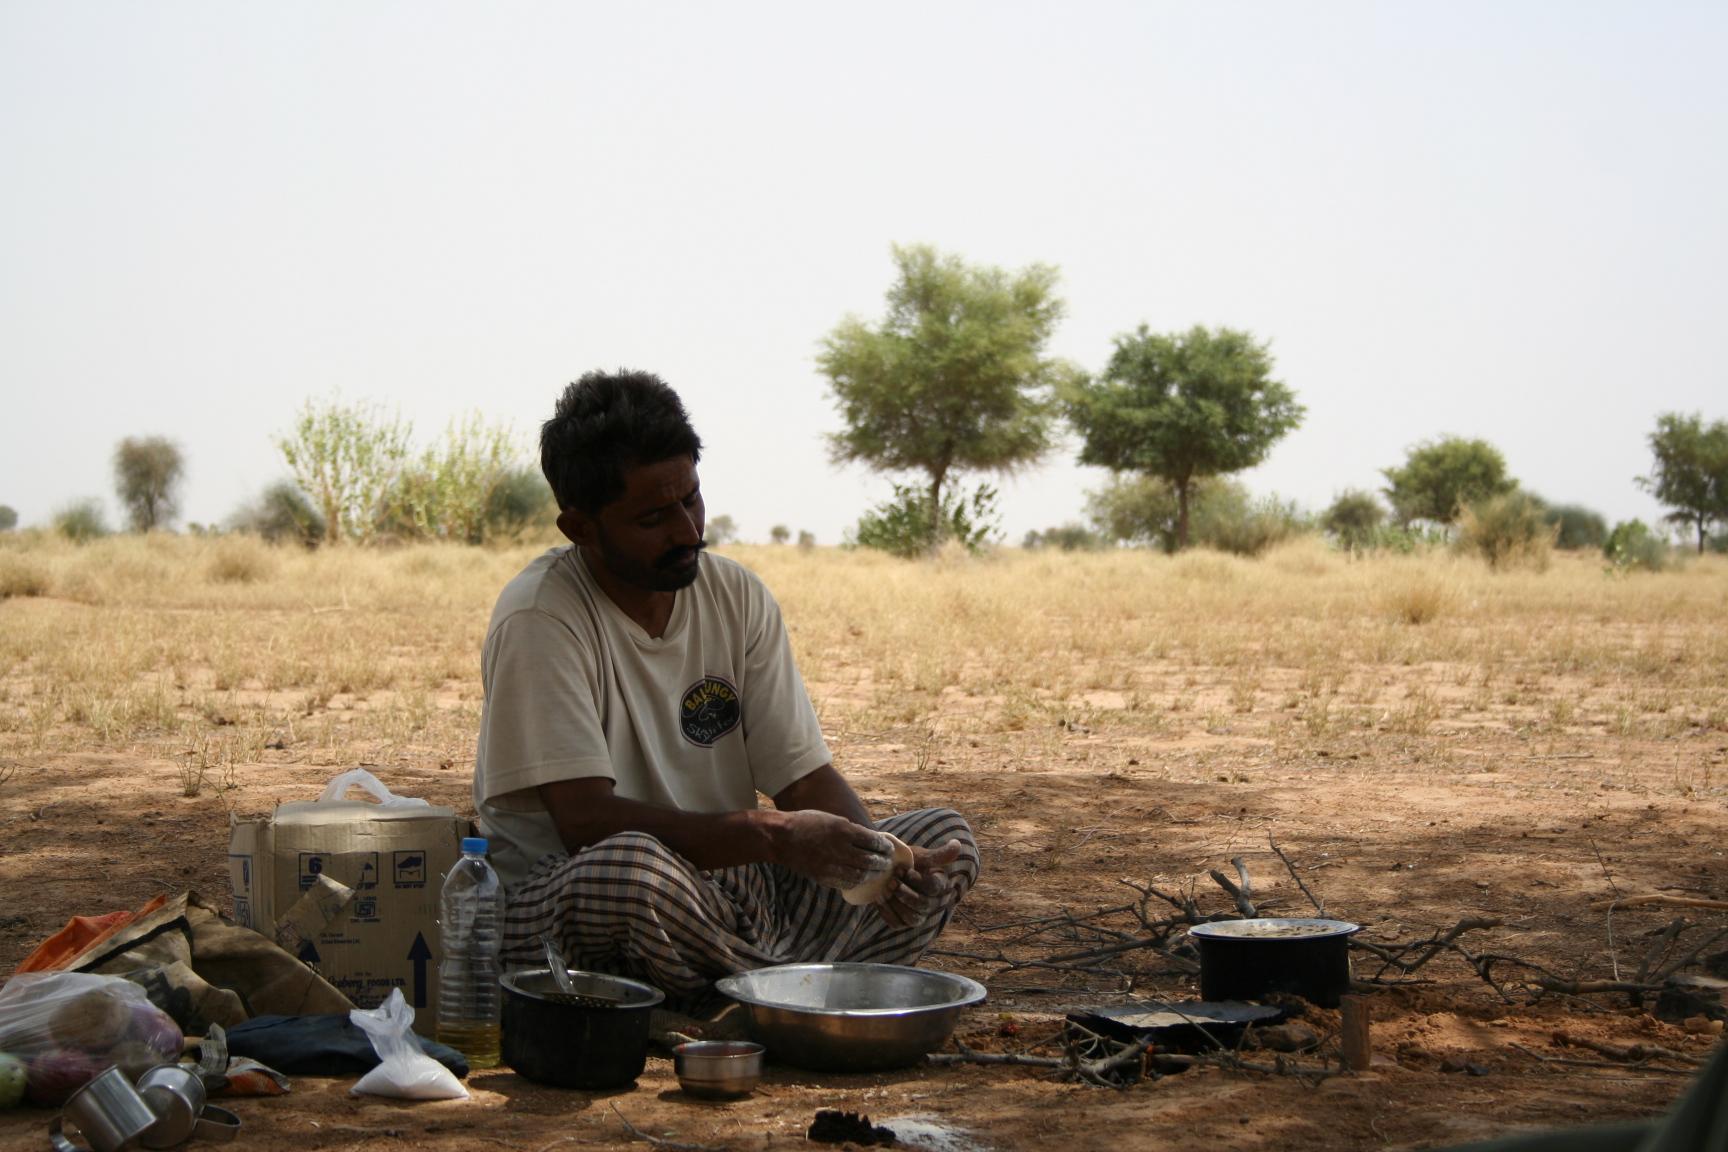 Jaisalmer - cooking in the desert